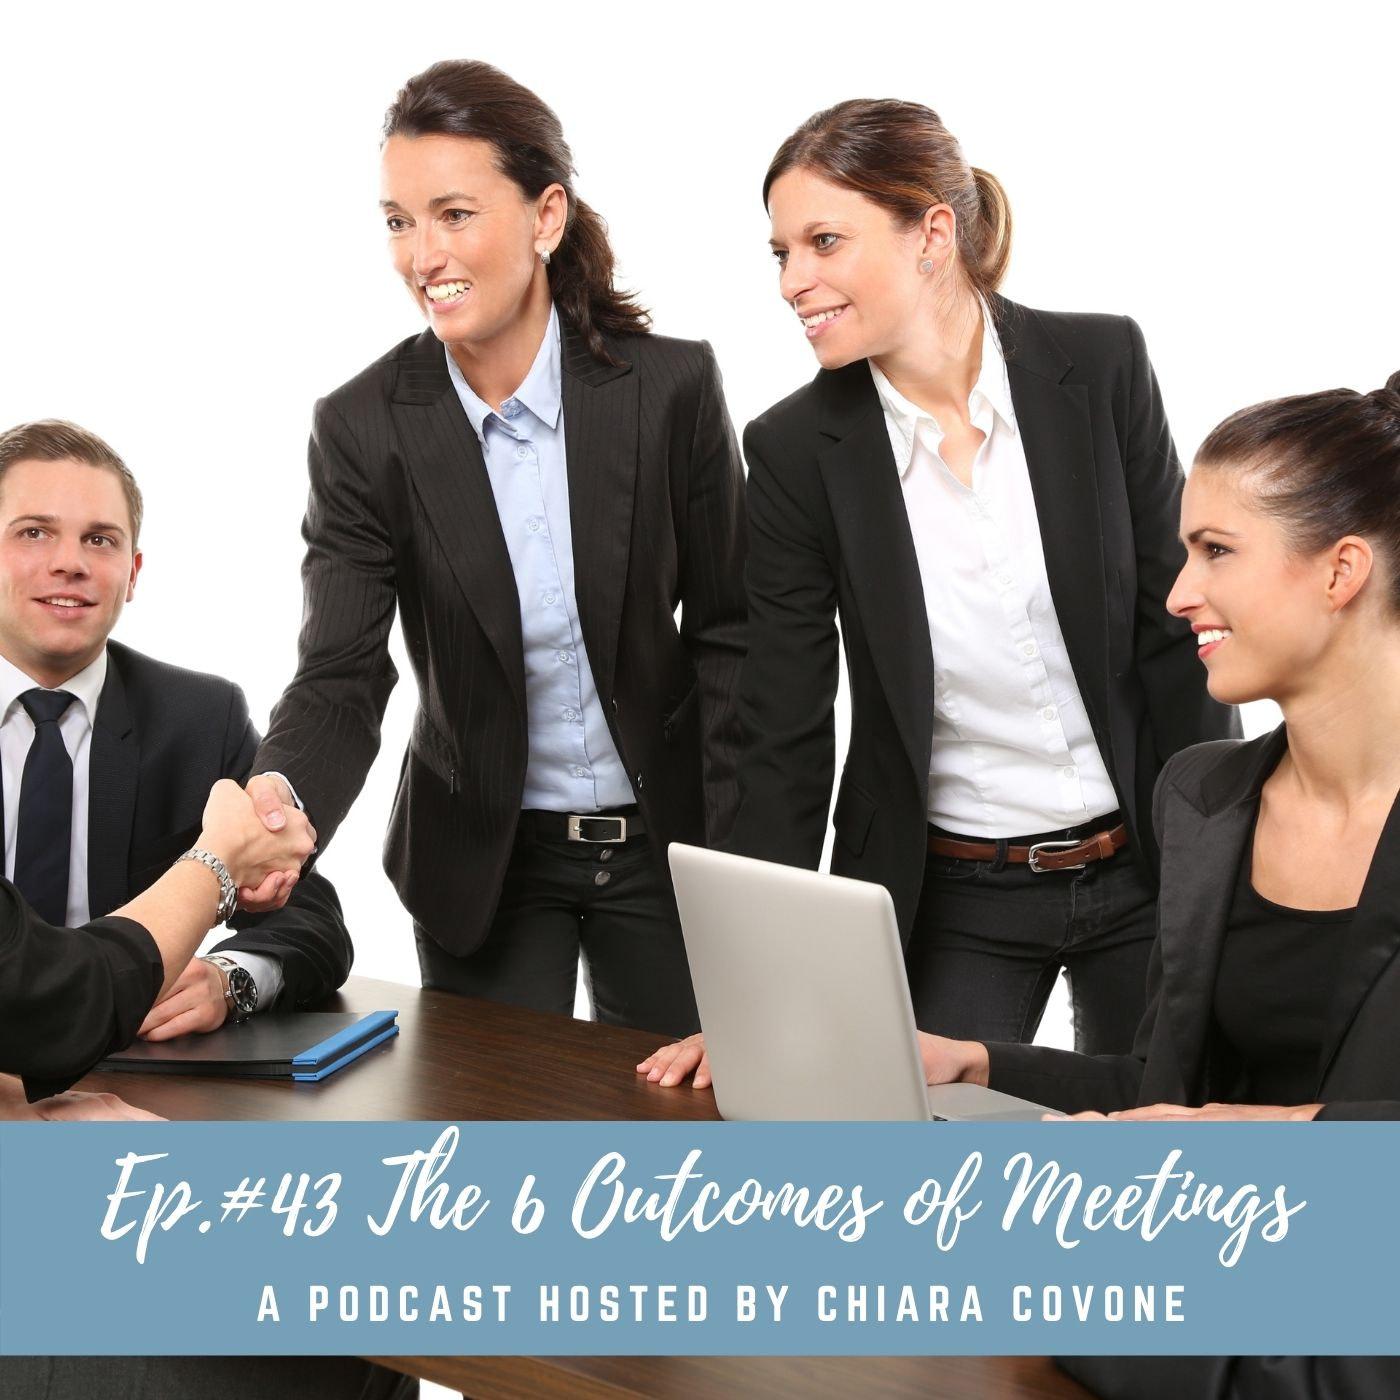 Innovation Made Easy Podcast